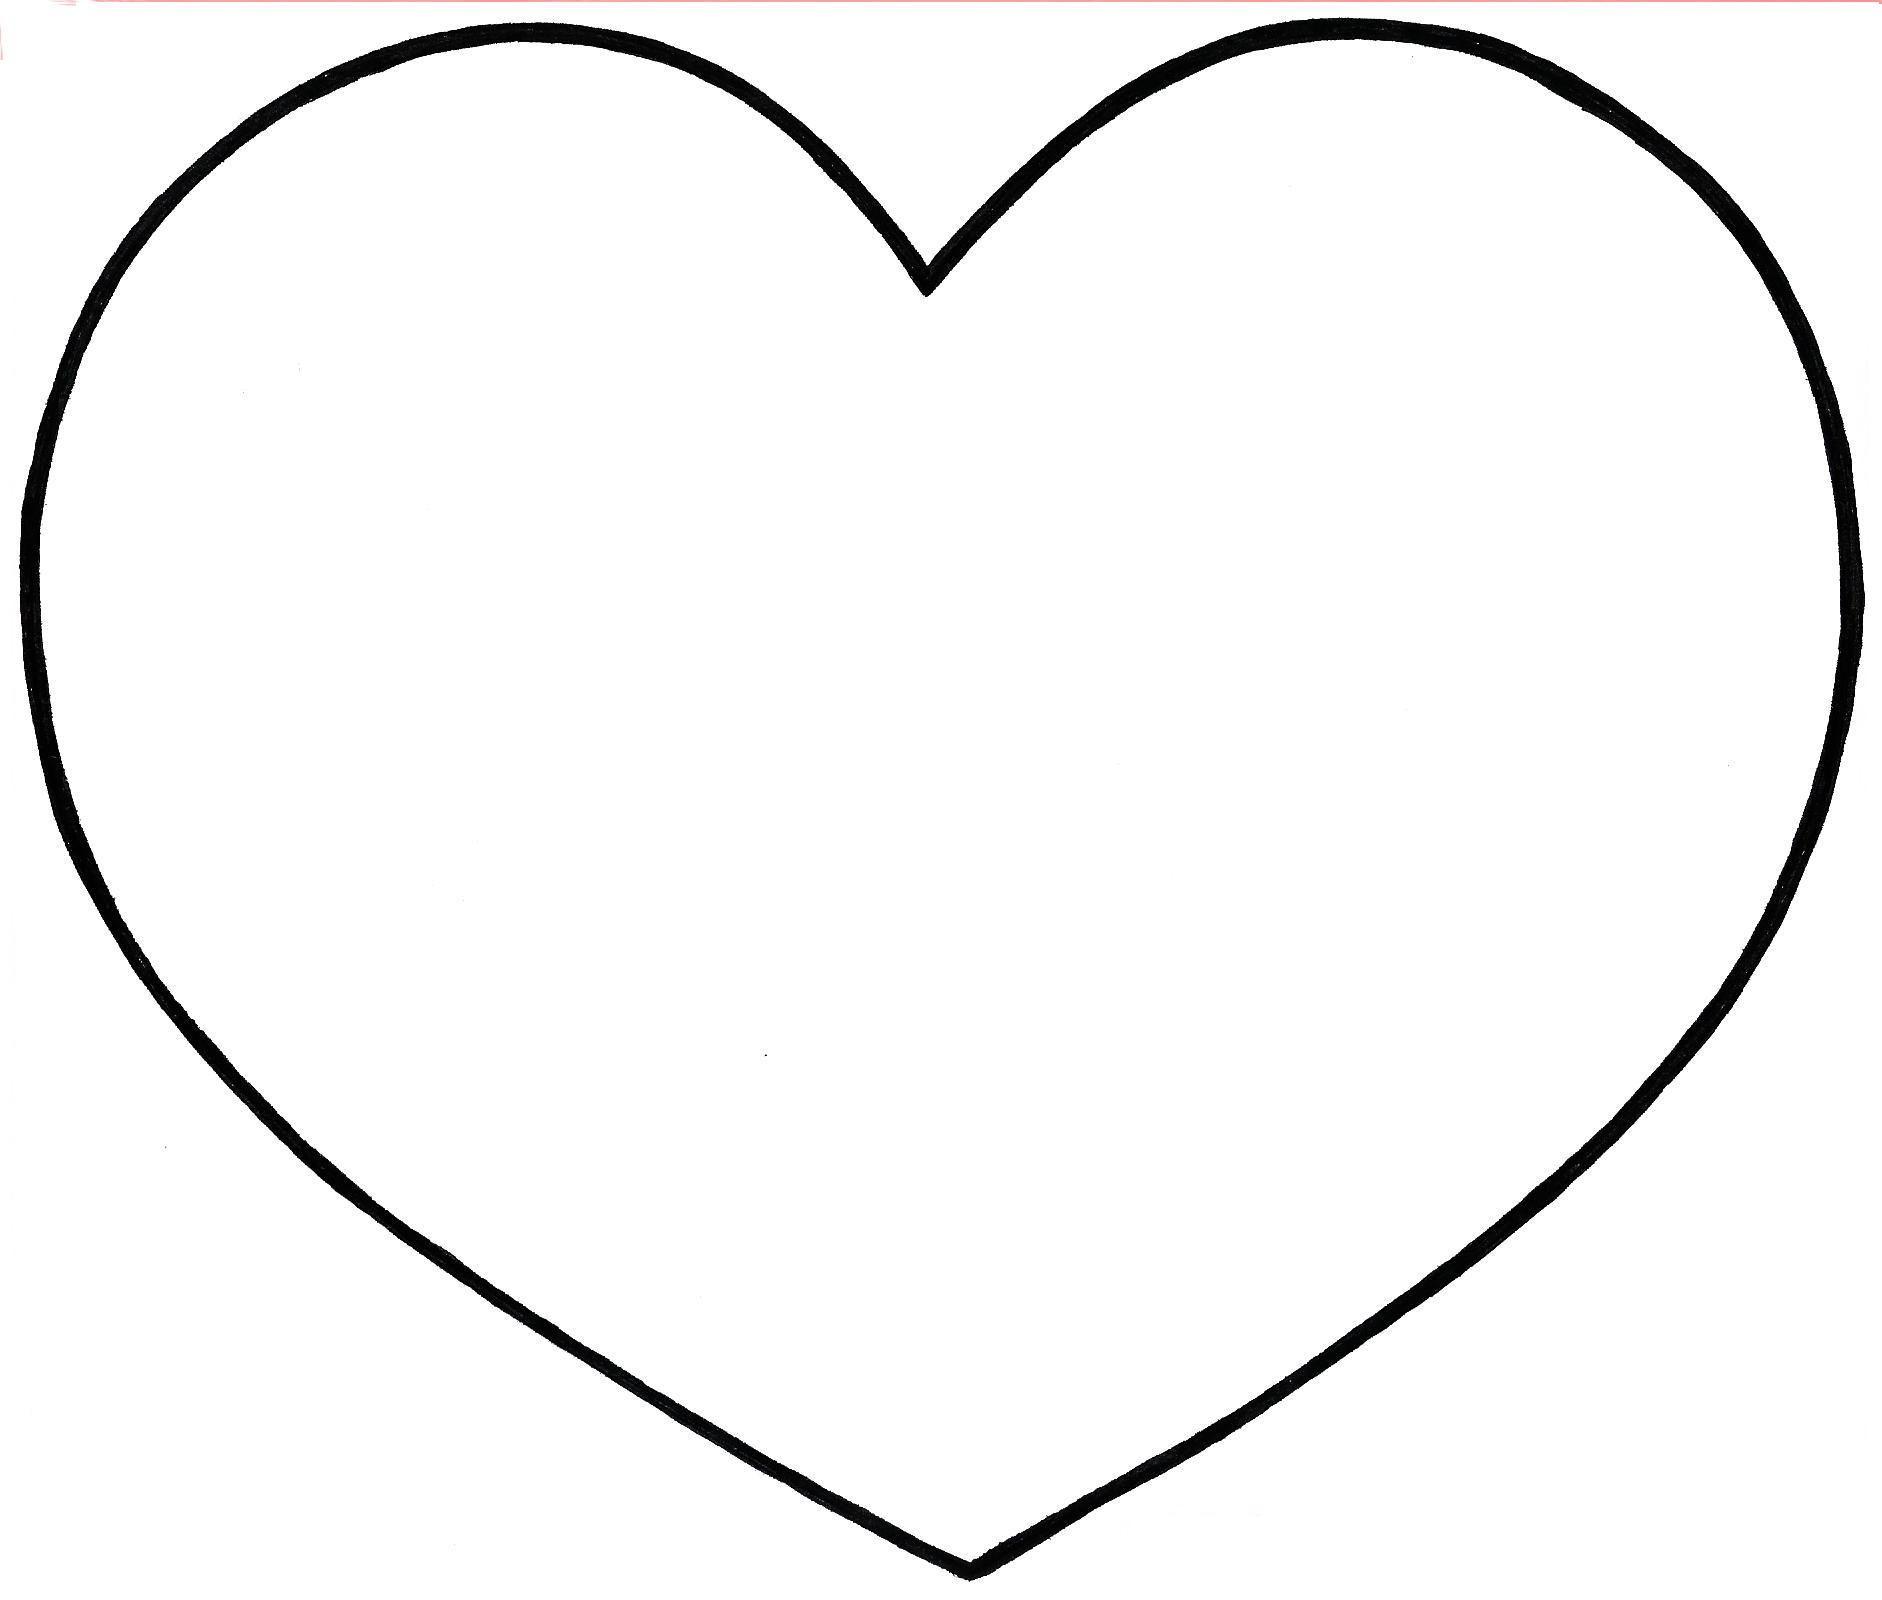 Afficher L Image D Origine Serca Dessin Coeur Coloriage Coeur